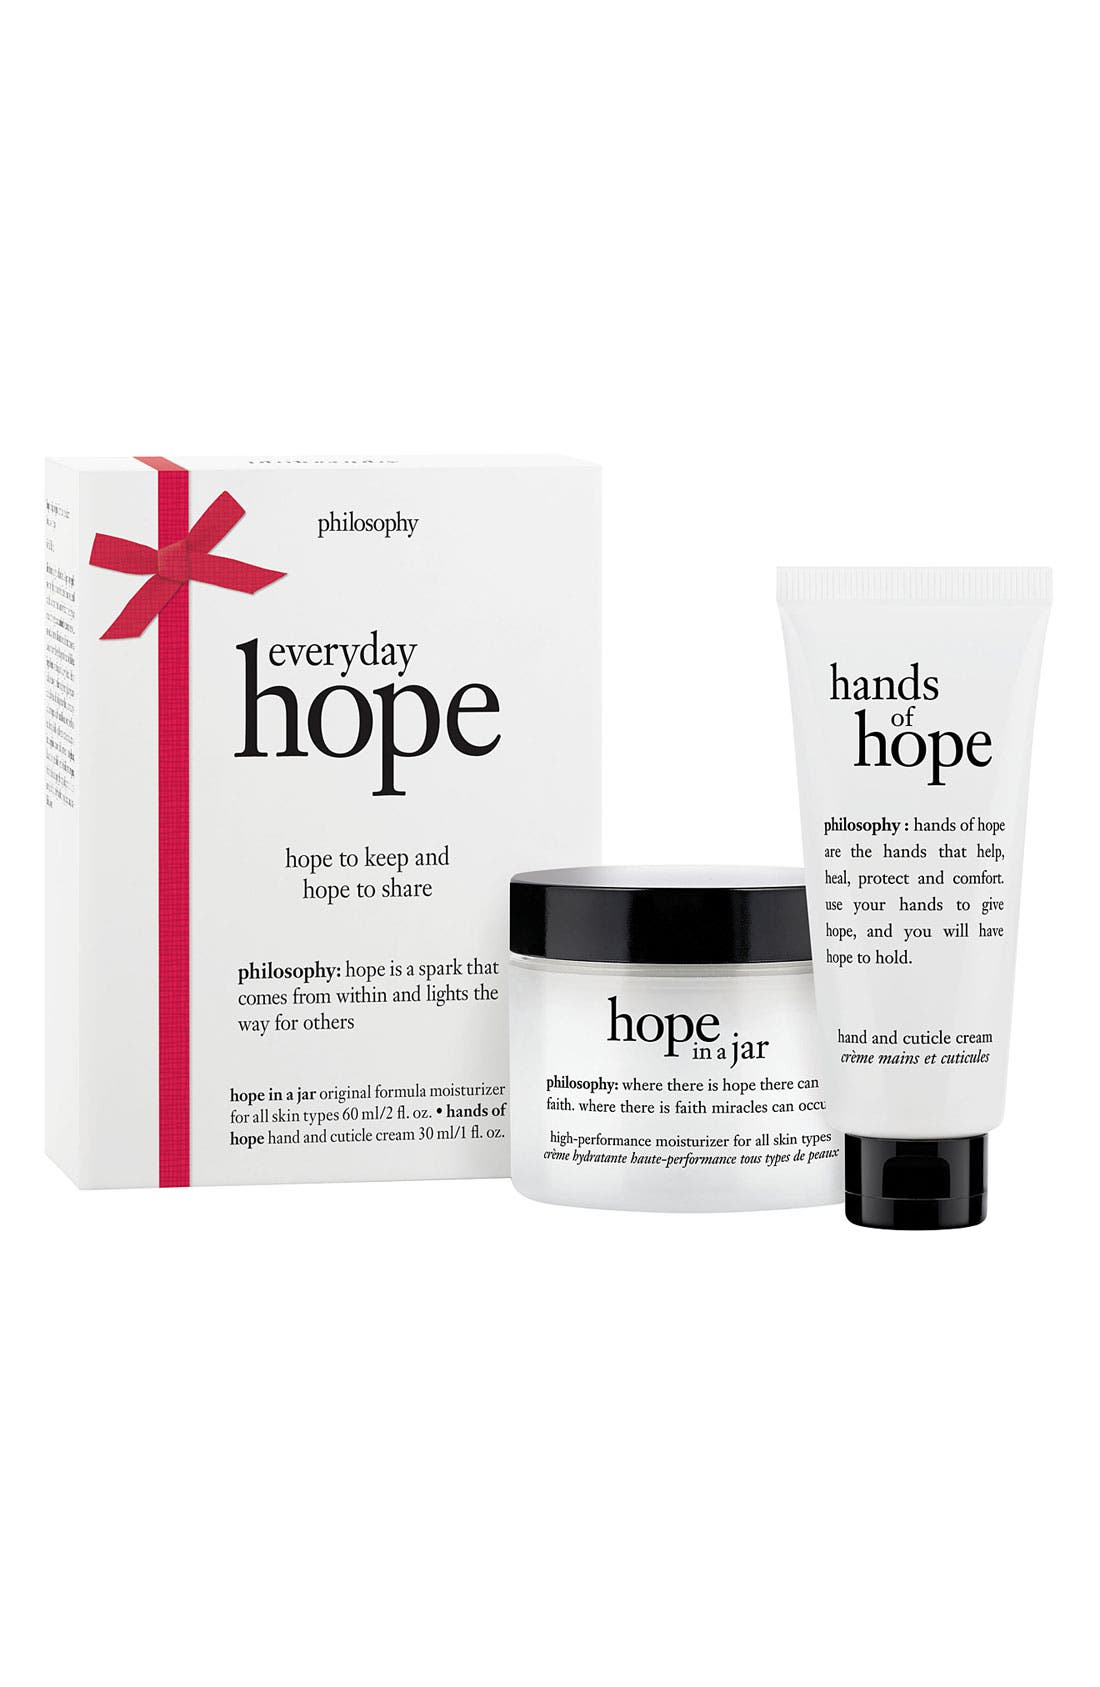 Alternate Image 1 Selected - philosophy 'holiday hope' bonus set ($49 value)